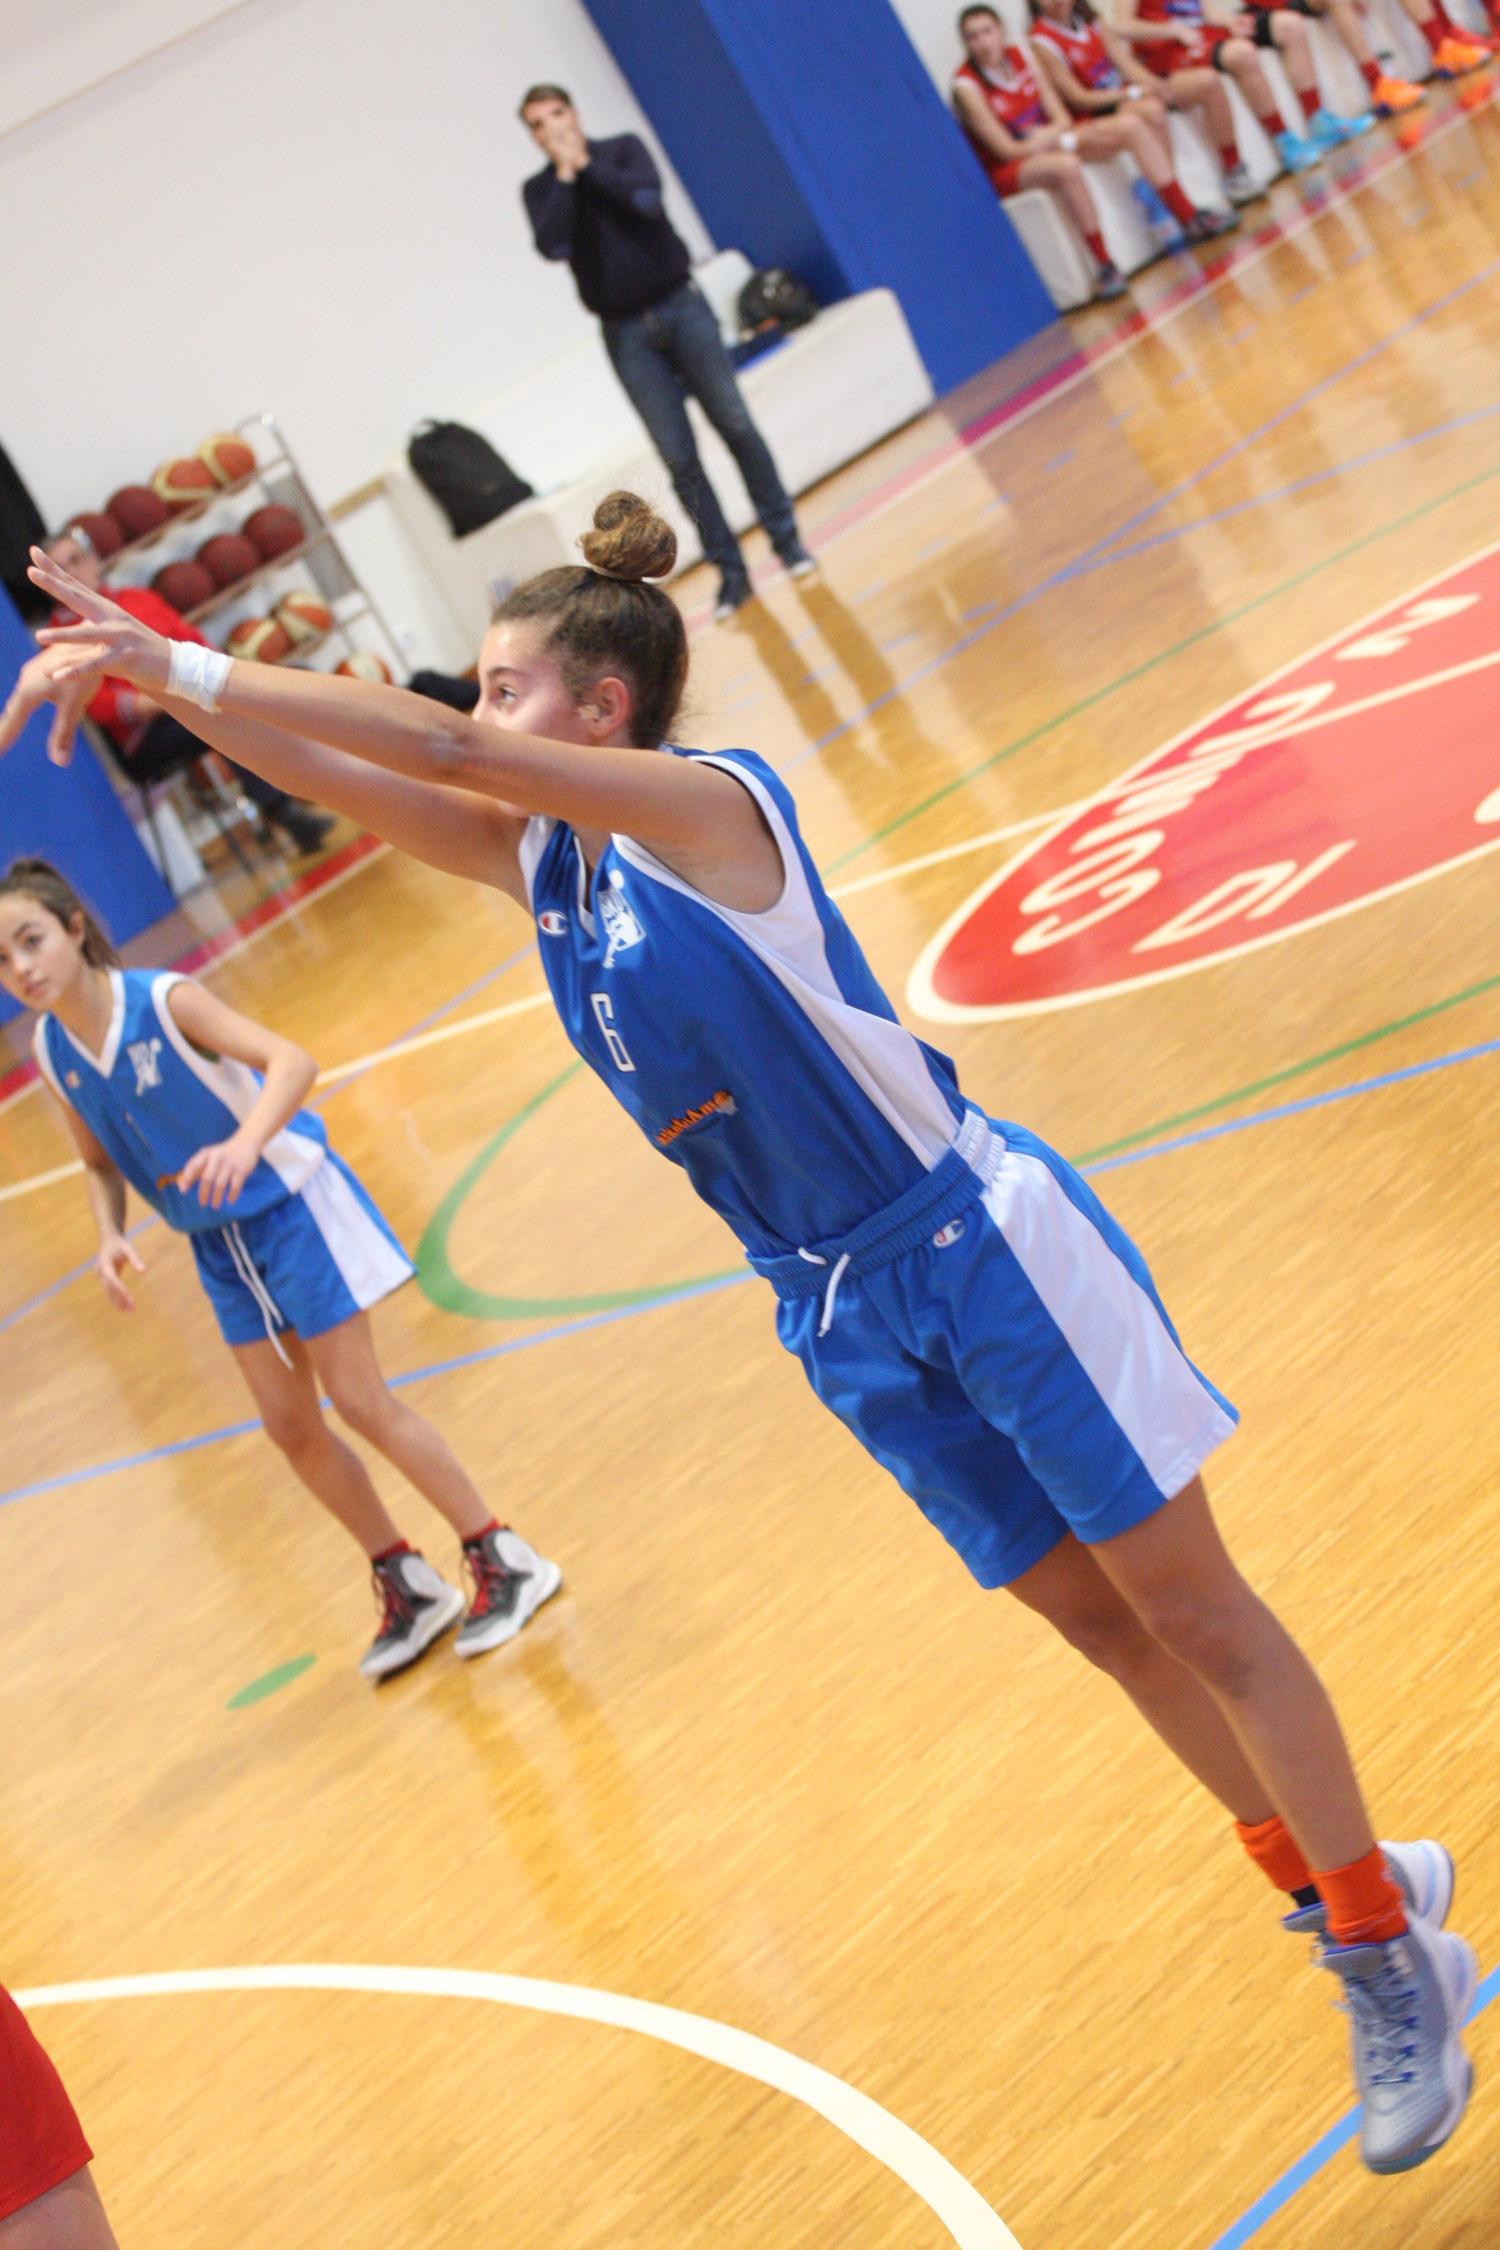 U16E - Costa Masnaga vs Baskettiamo Vittuone 2001 00025.jpg